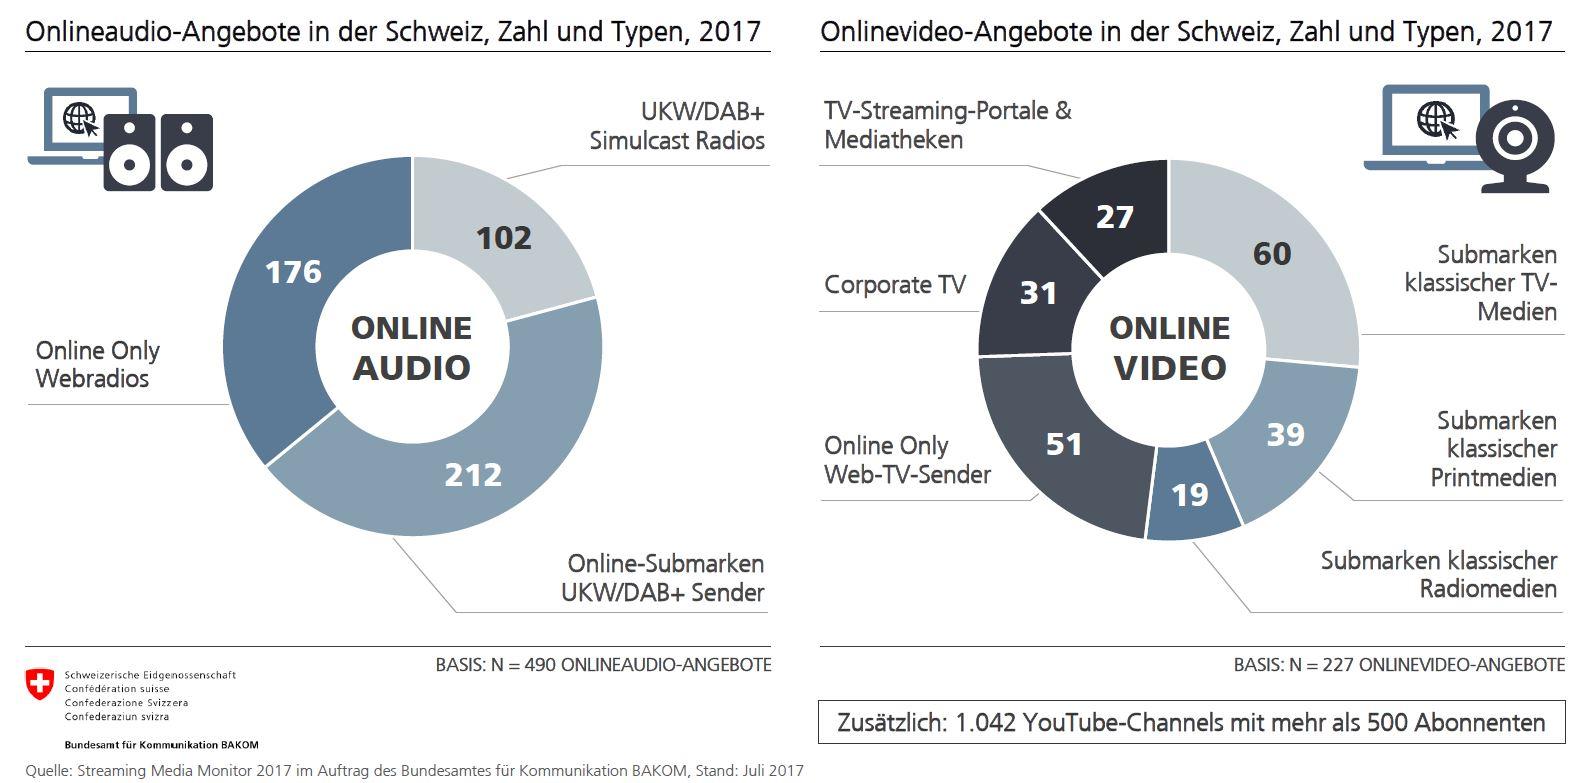 Streaming-Media-Monitor-Schweiz-2017_Grafik_Angebote